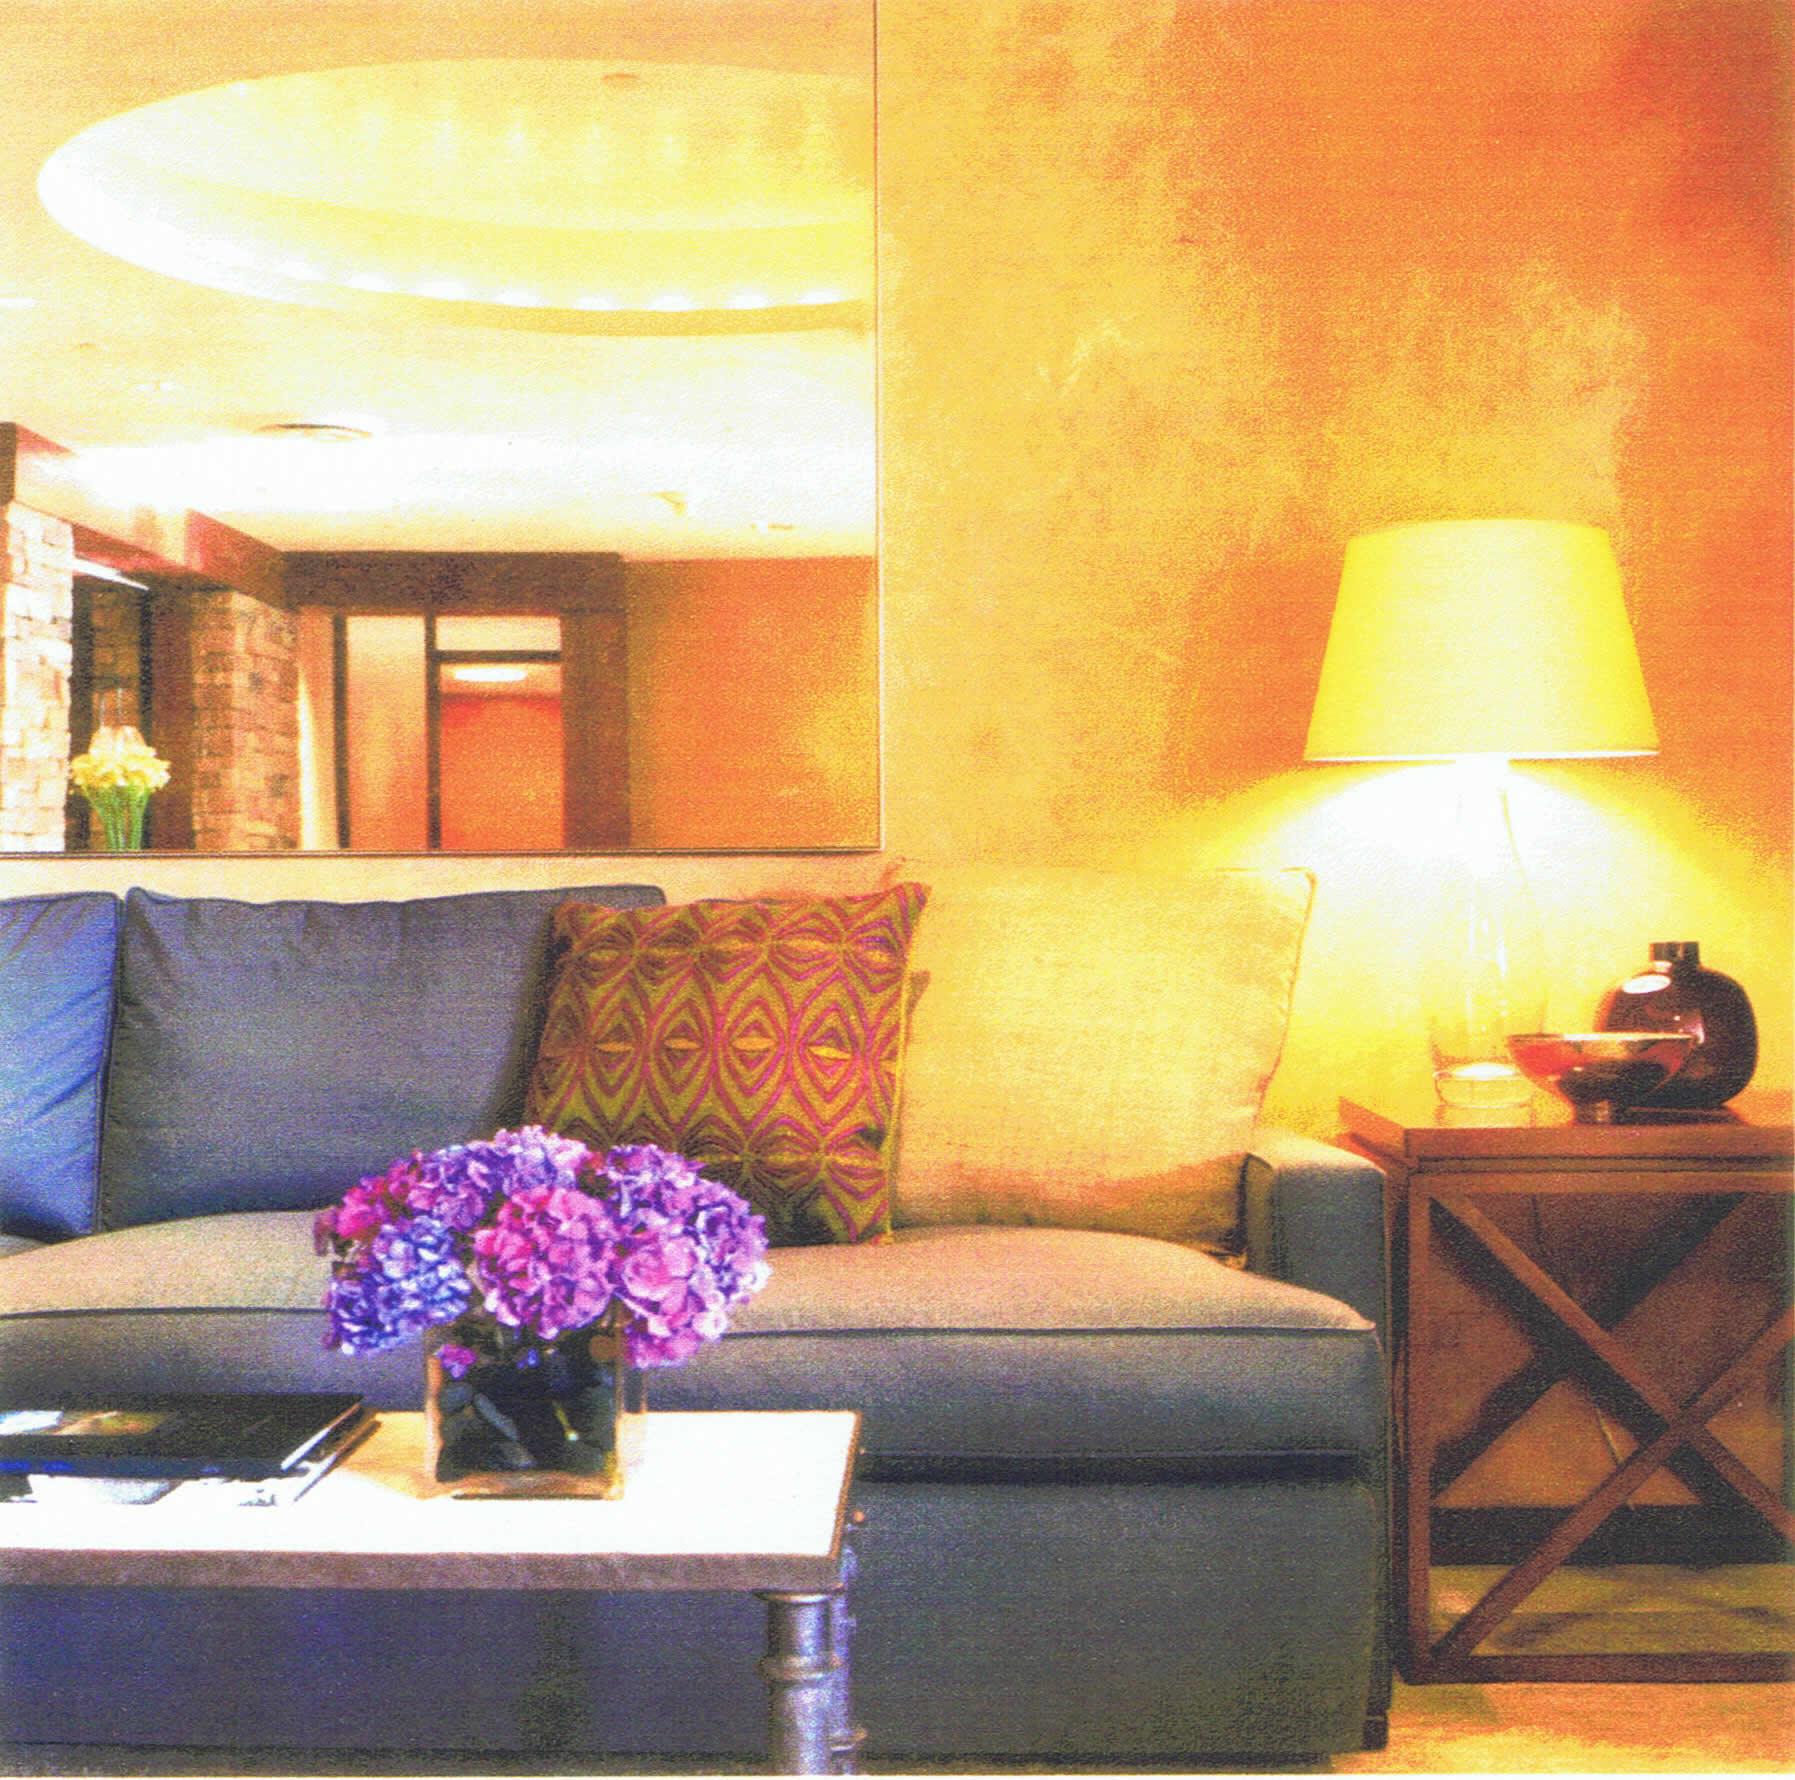 Santa monica arts and homes by anna hackathorn - Santa monica interior design firms ...